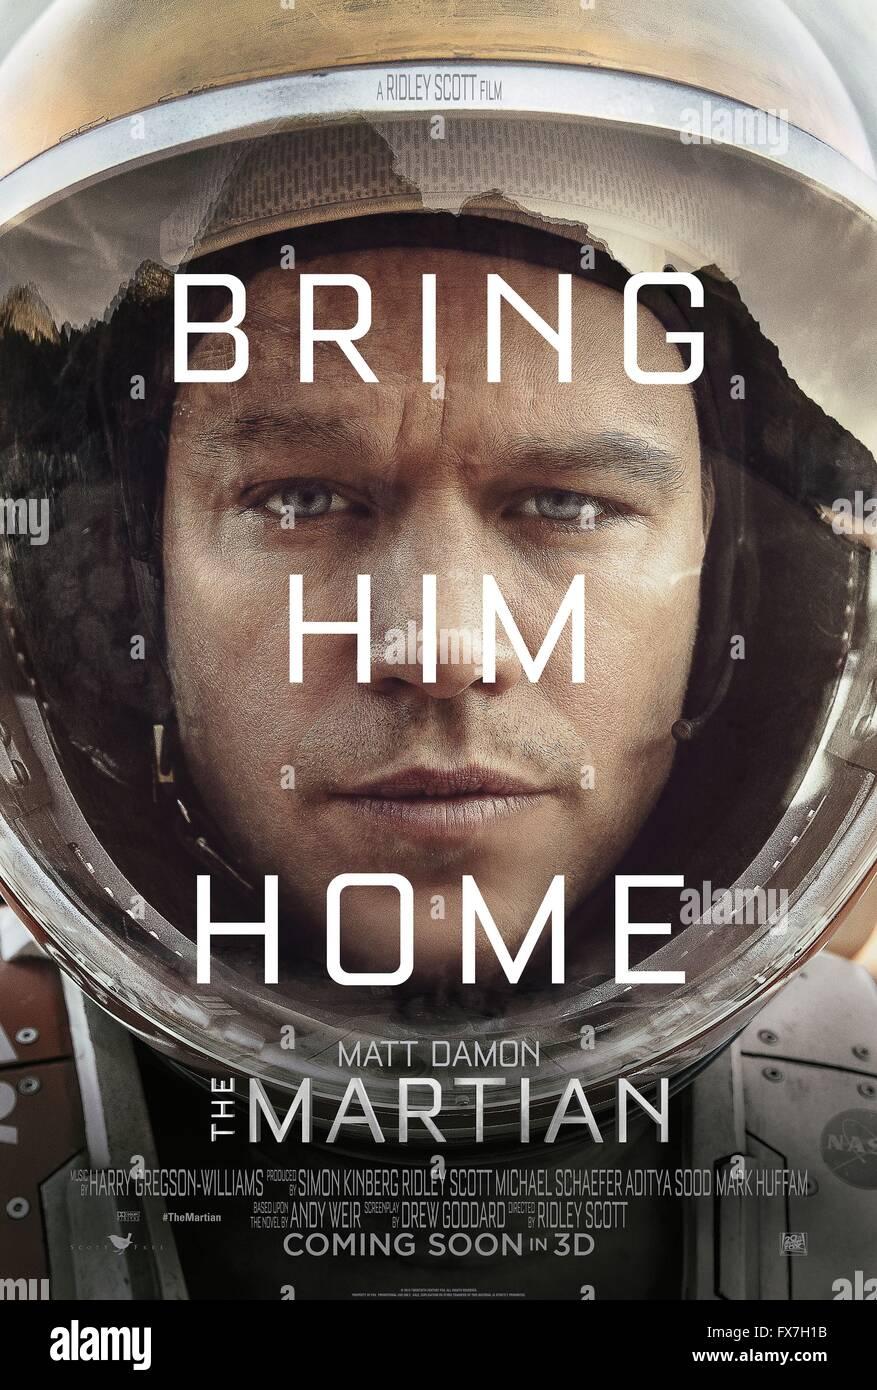 The Martian Year : 2015 USA Director : Ridley Scott Matt Damon Movie poster (USA) - Stock Image